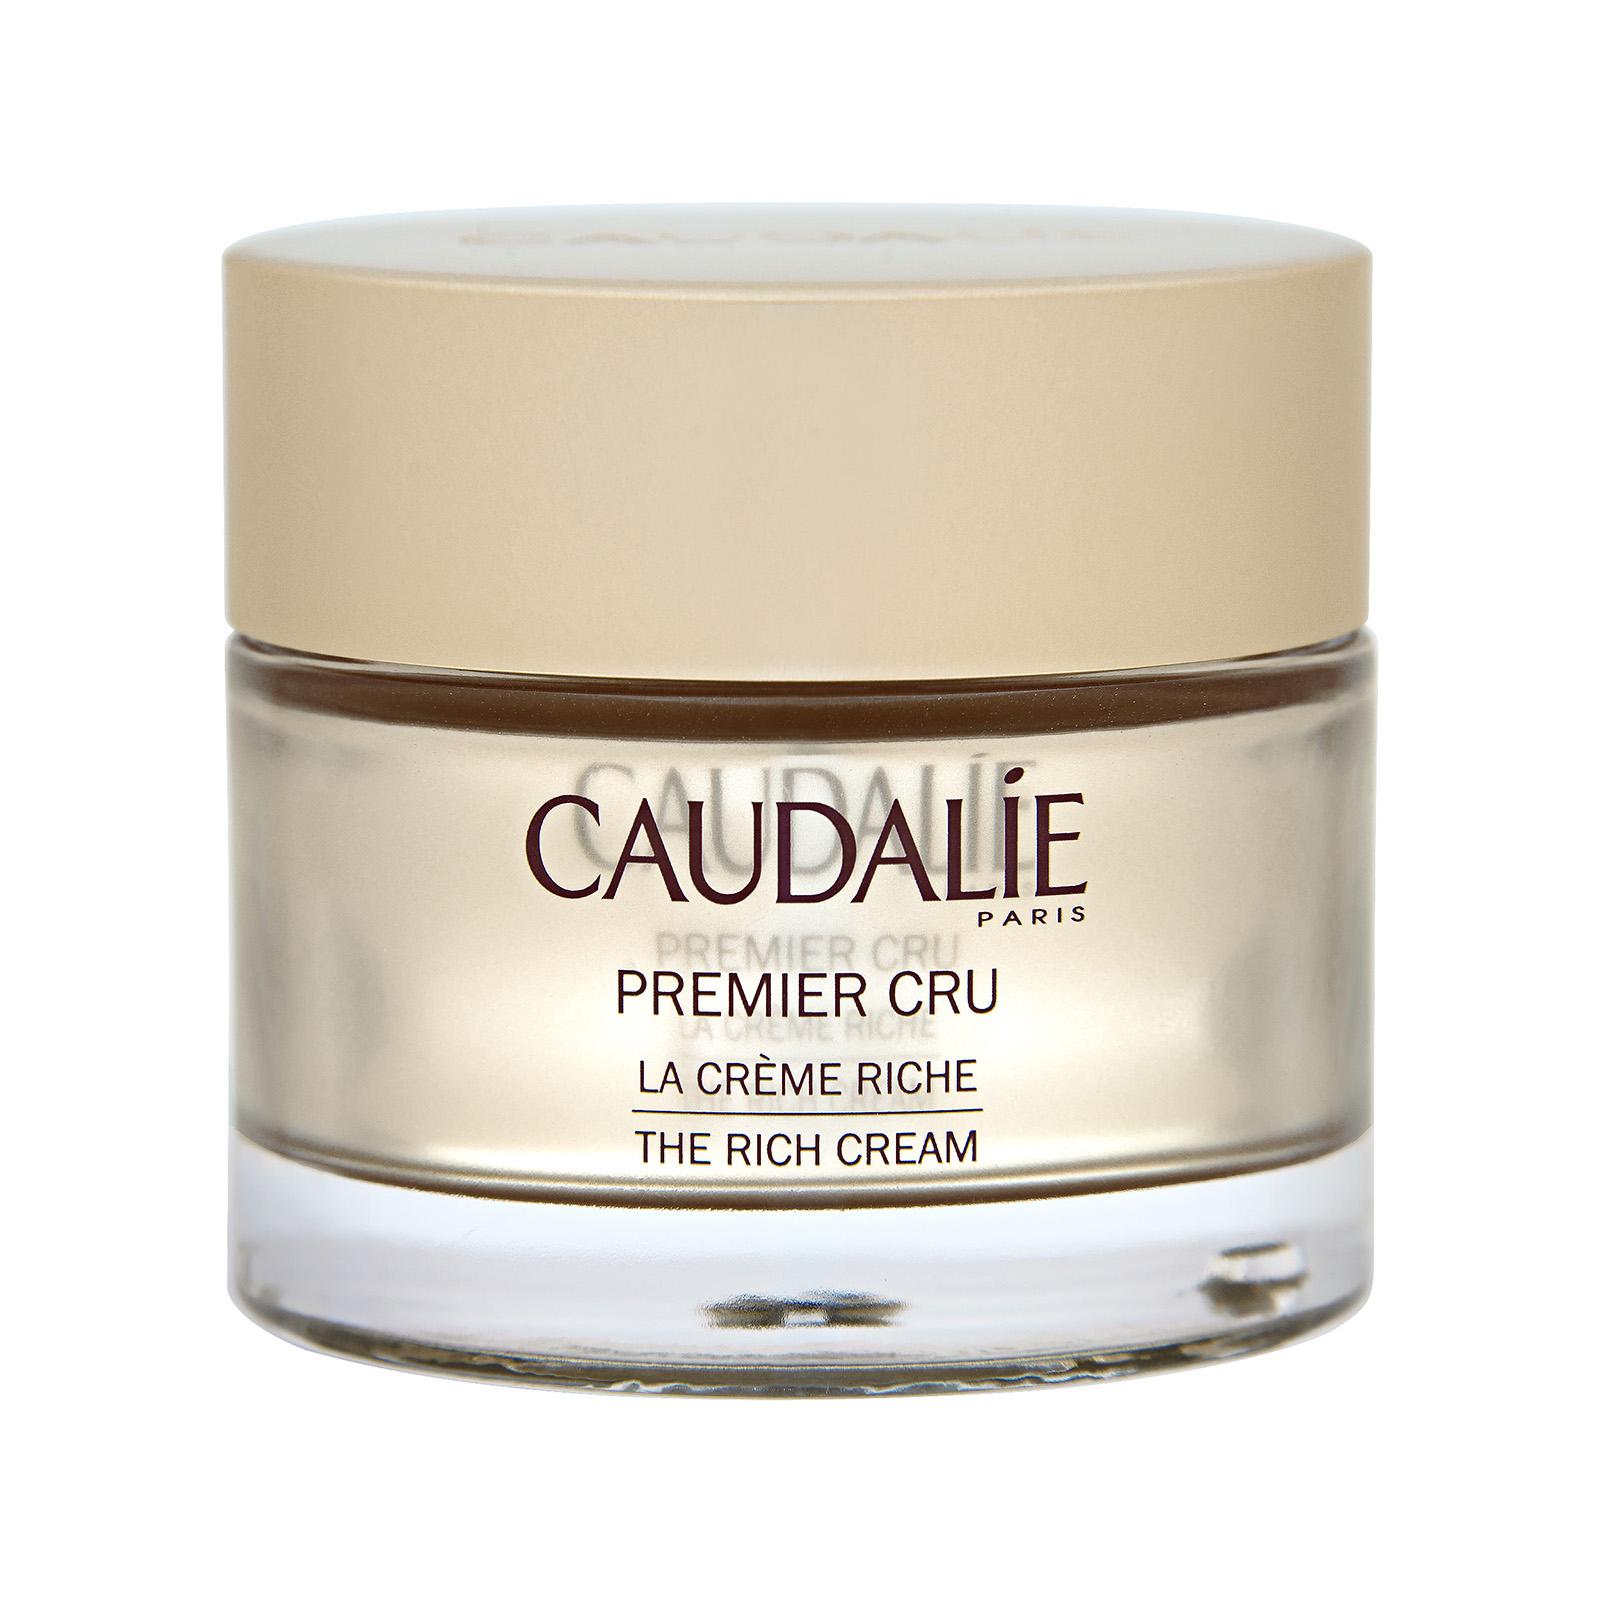 CAUDALIE Premier Cru  Creme Riche (Dry Skin) 1.7oz, 50ml from Cosme-De.com